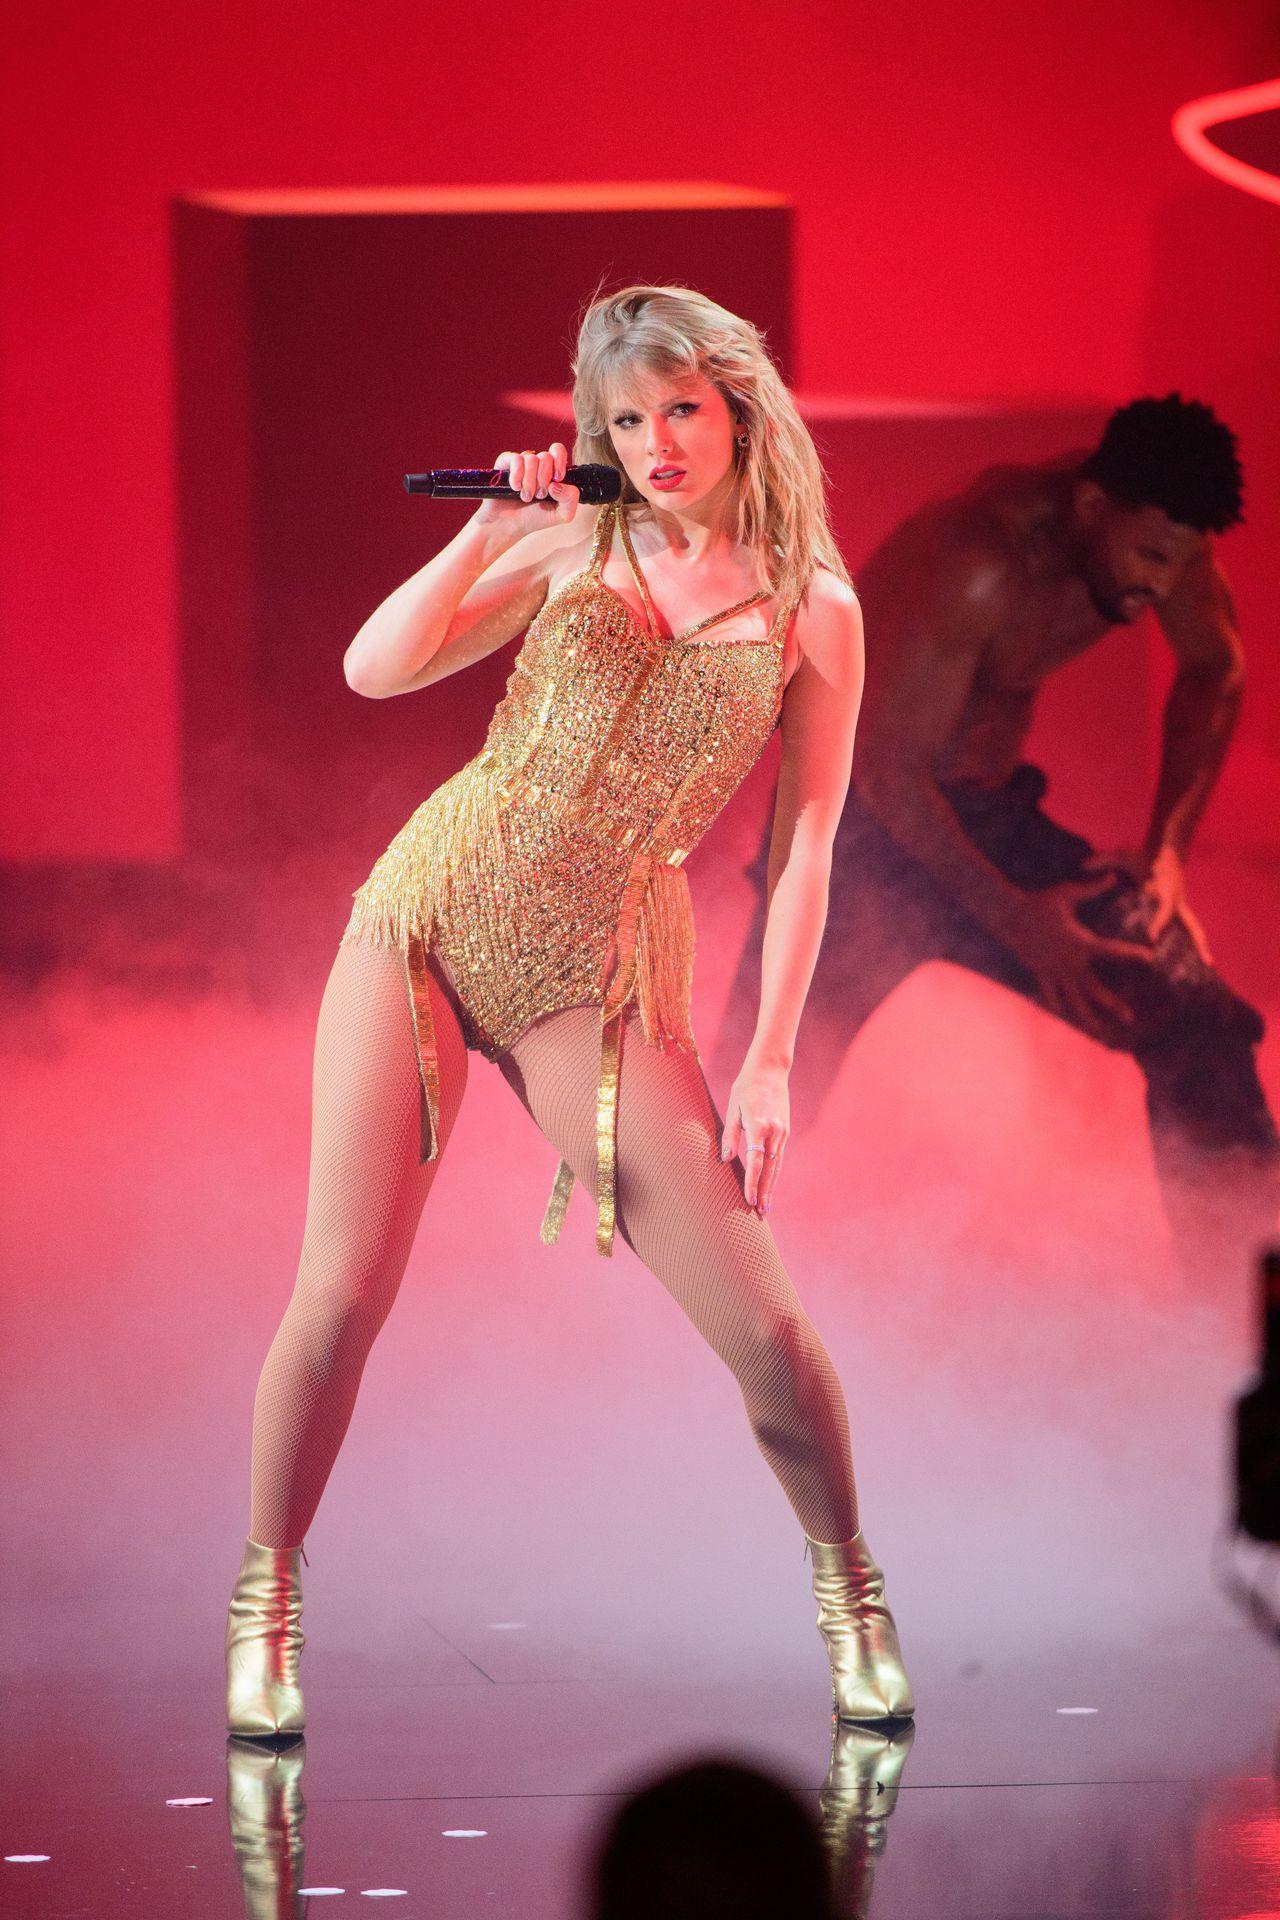 Taylor Swift Sexy 0106